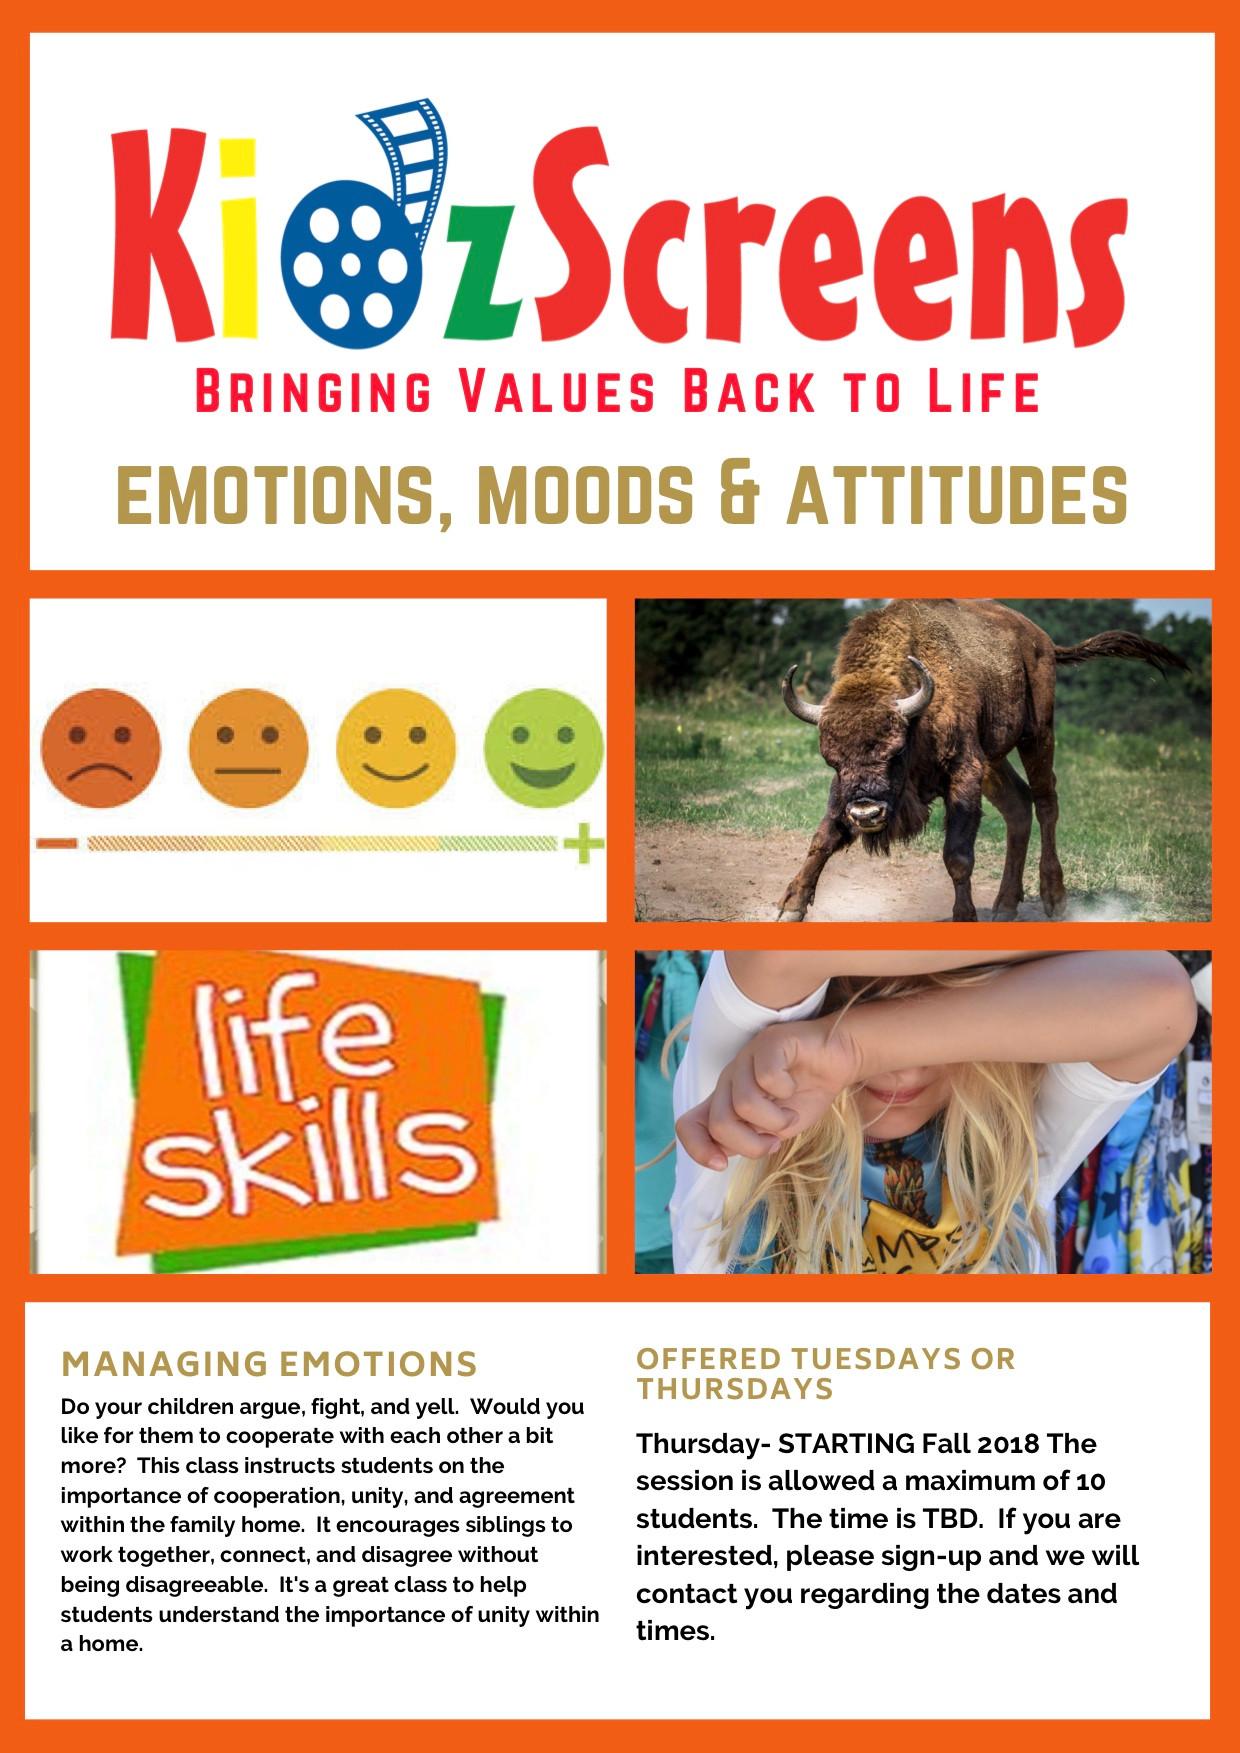 Emotional Health & Balance